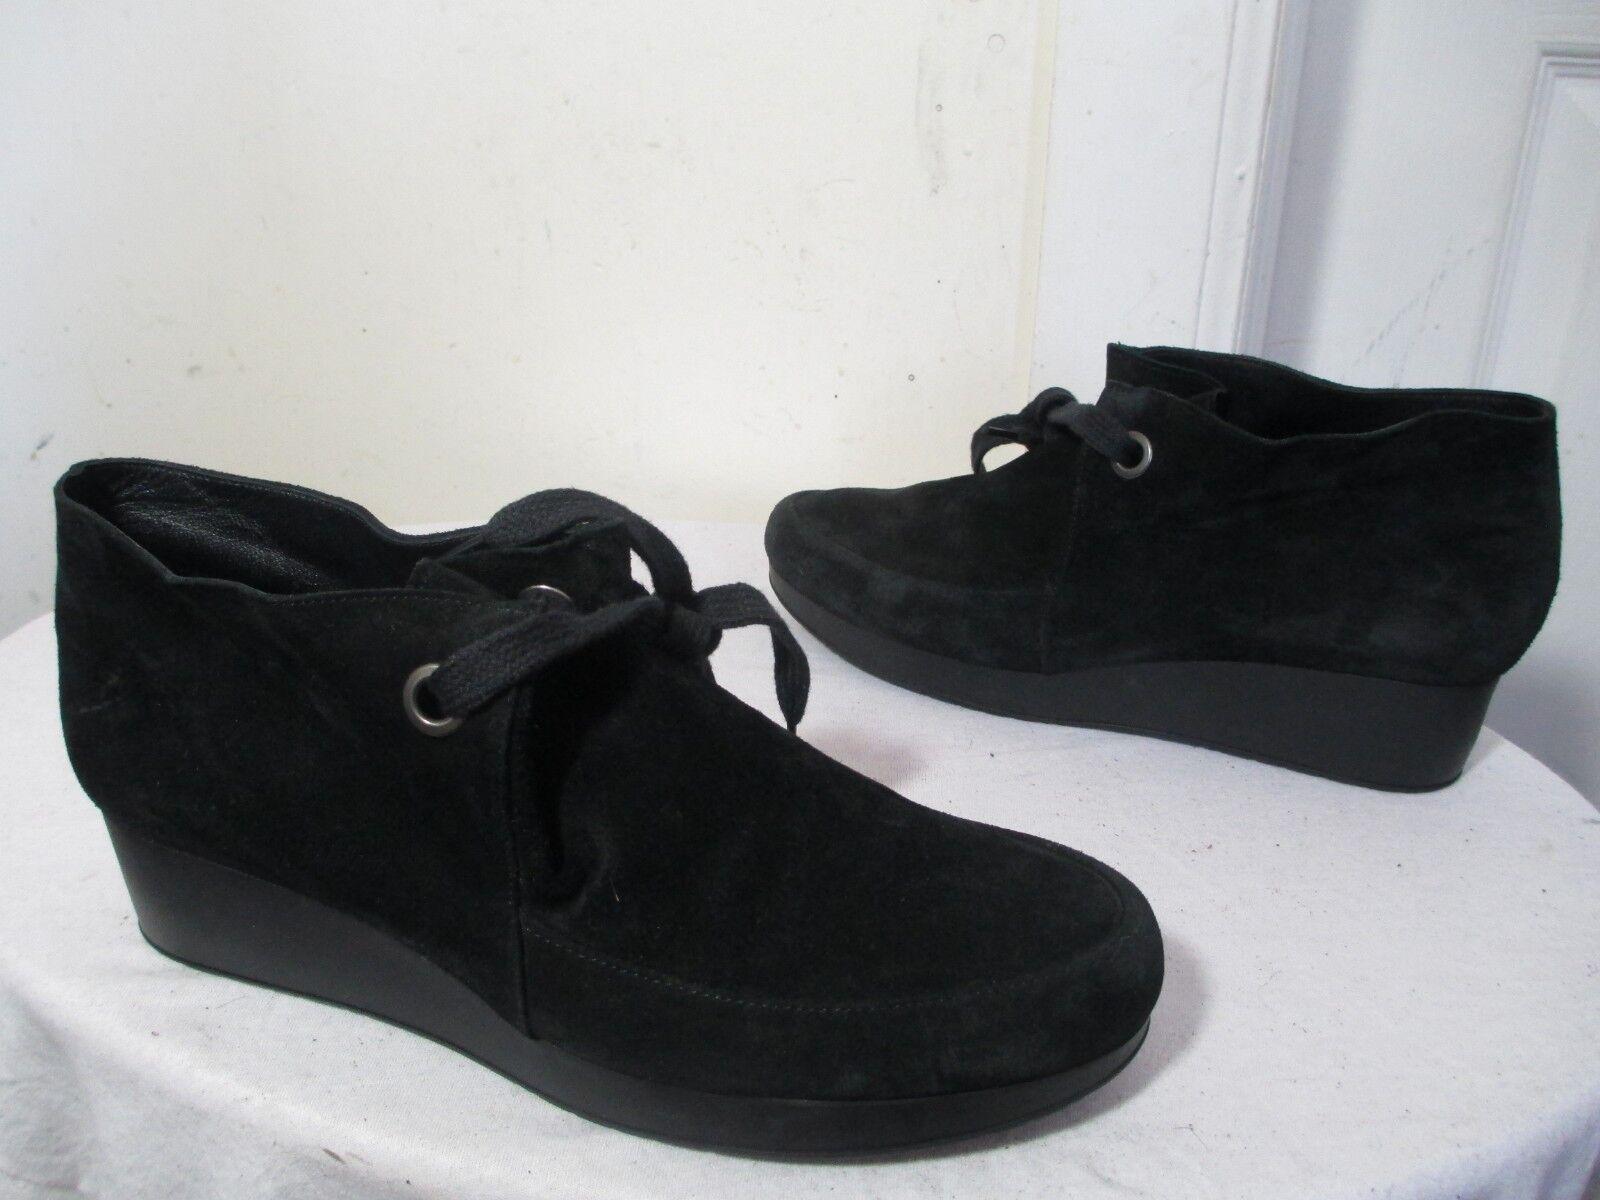 ROBERT CLERGERIE NANCYJ WOMEN'S BLK SUEDE WEDGE PLATFORM CHUKKA BOOTS 39½ B US 9